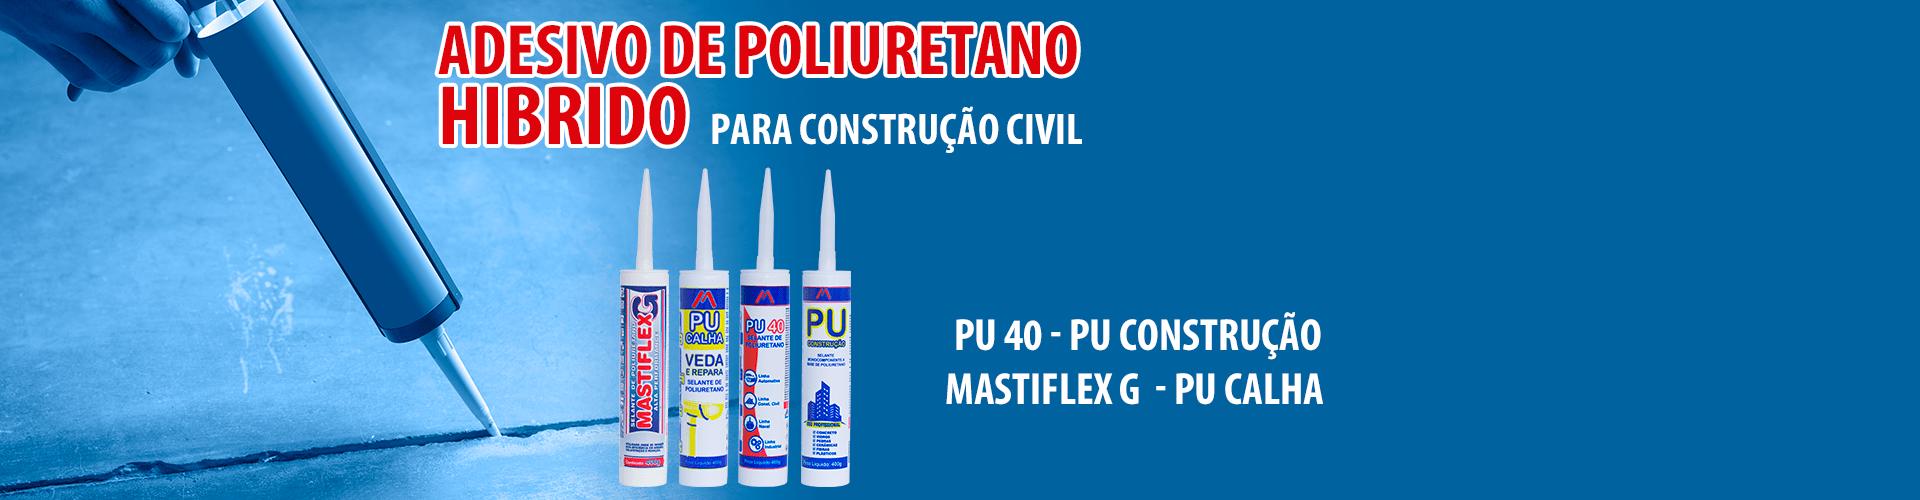 Mastiflex - Adesivo de Poliuretano Híbrido